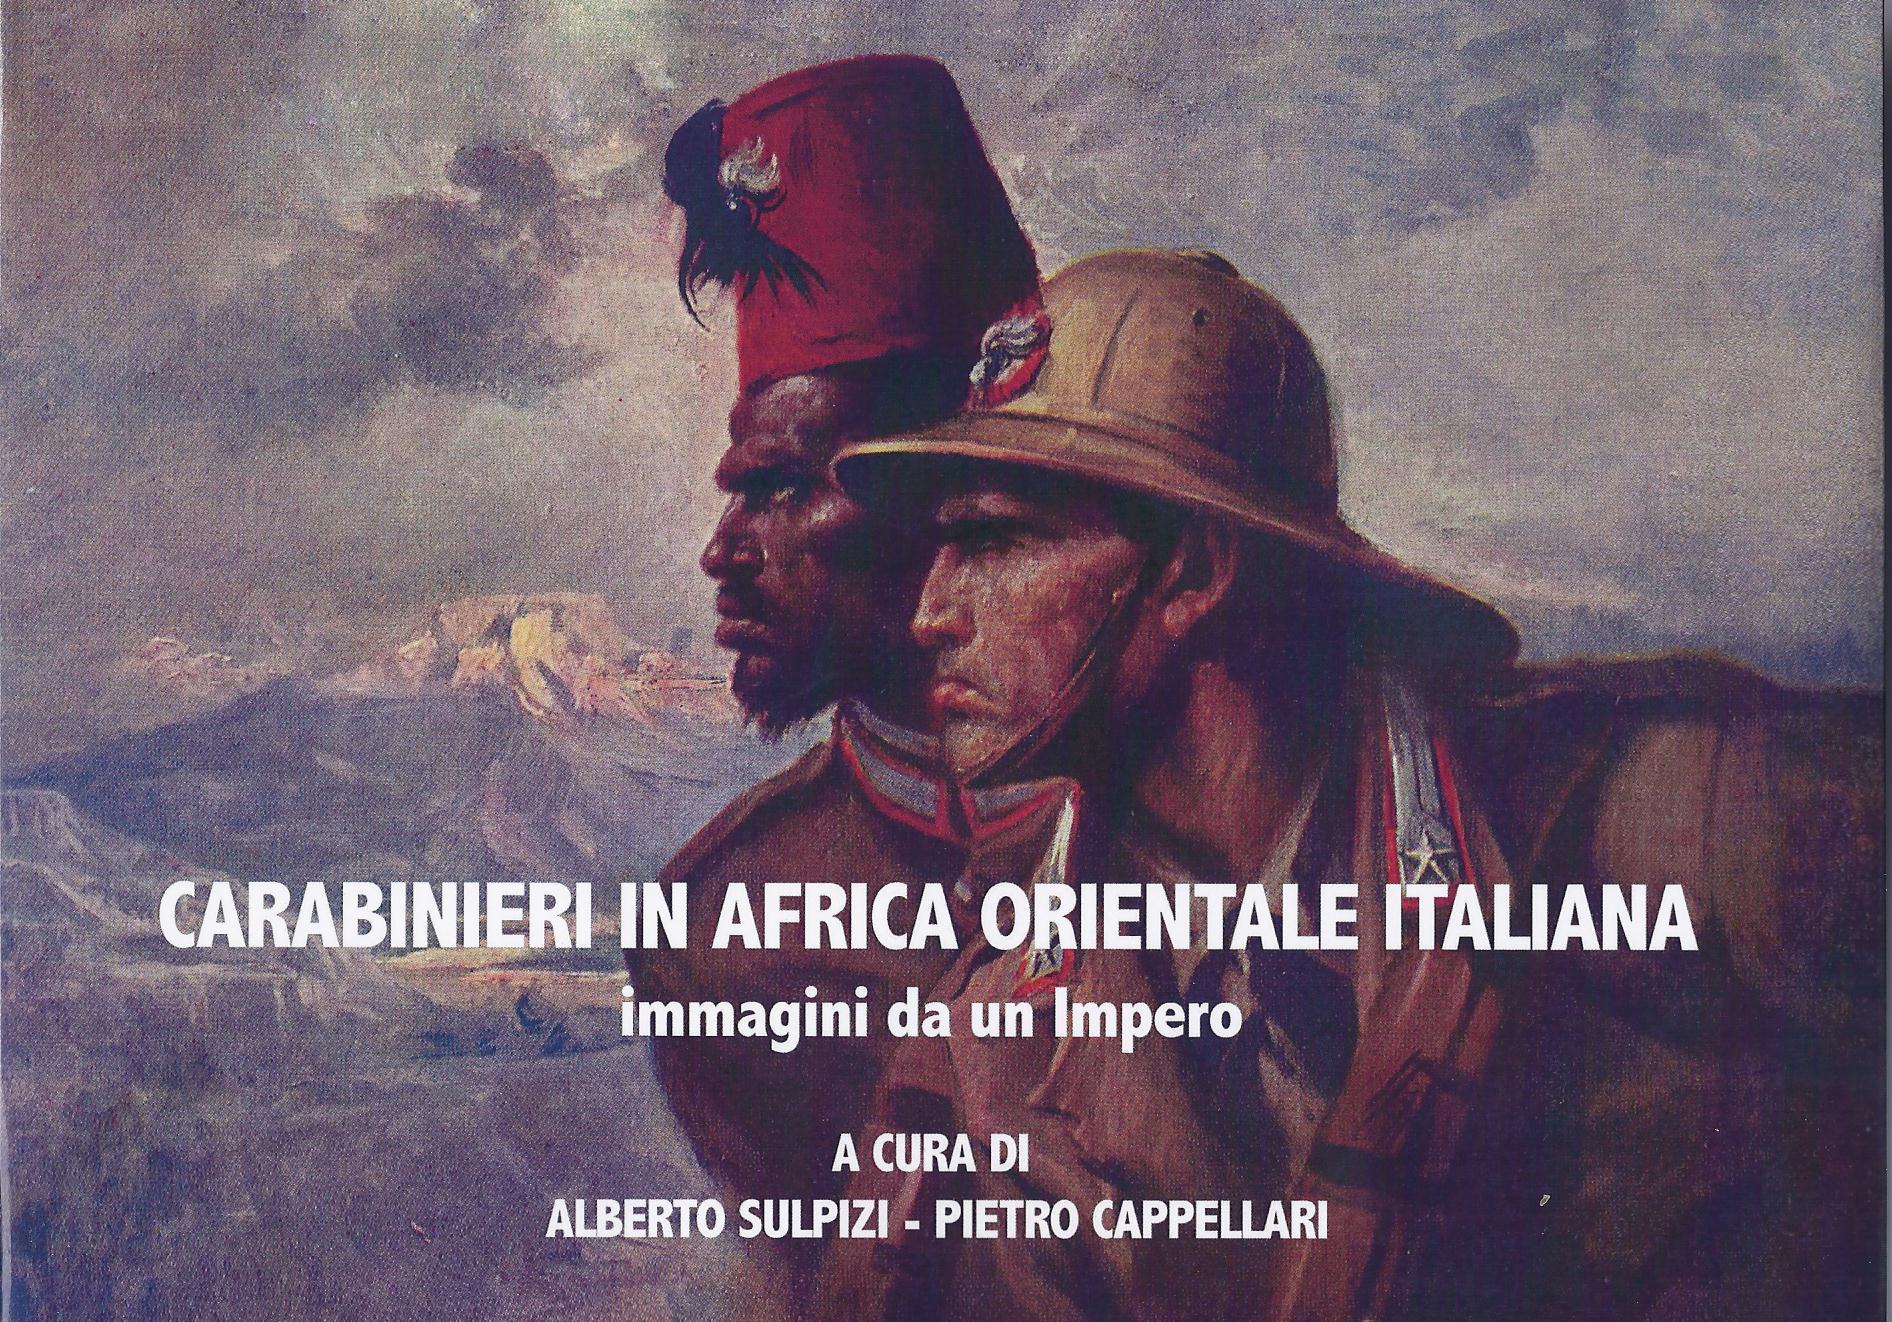 Carabinieri in Africa Orientale